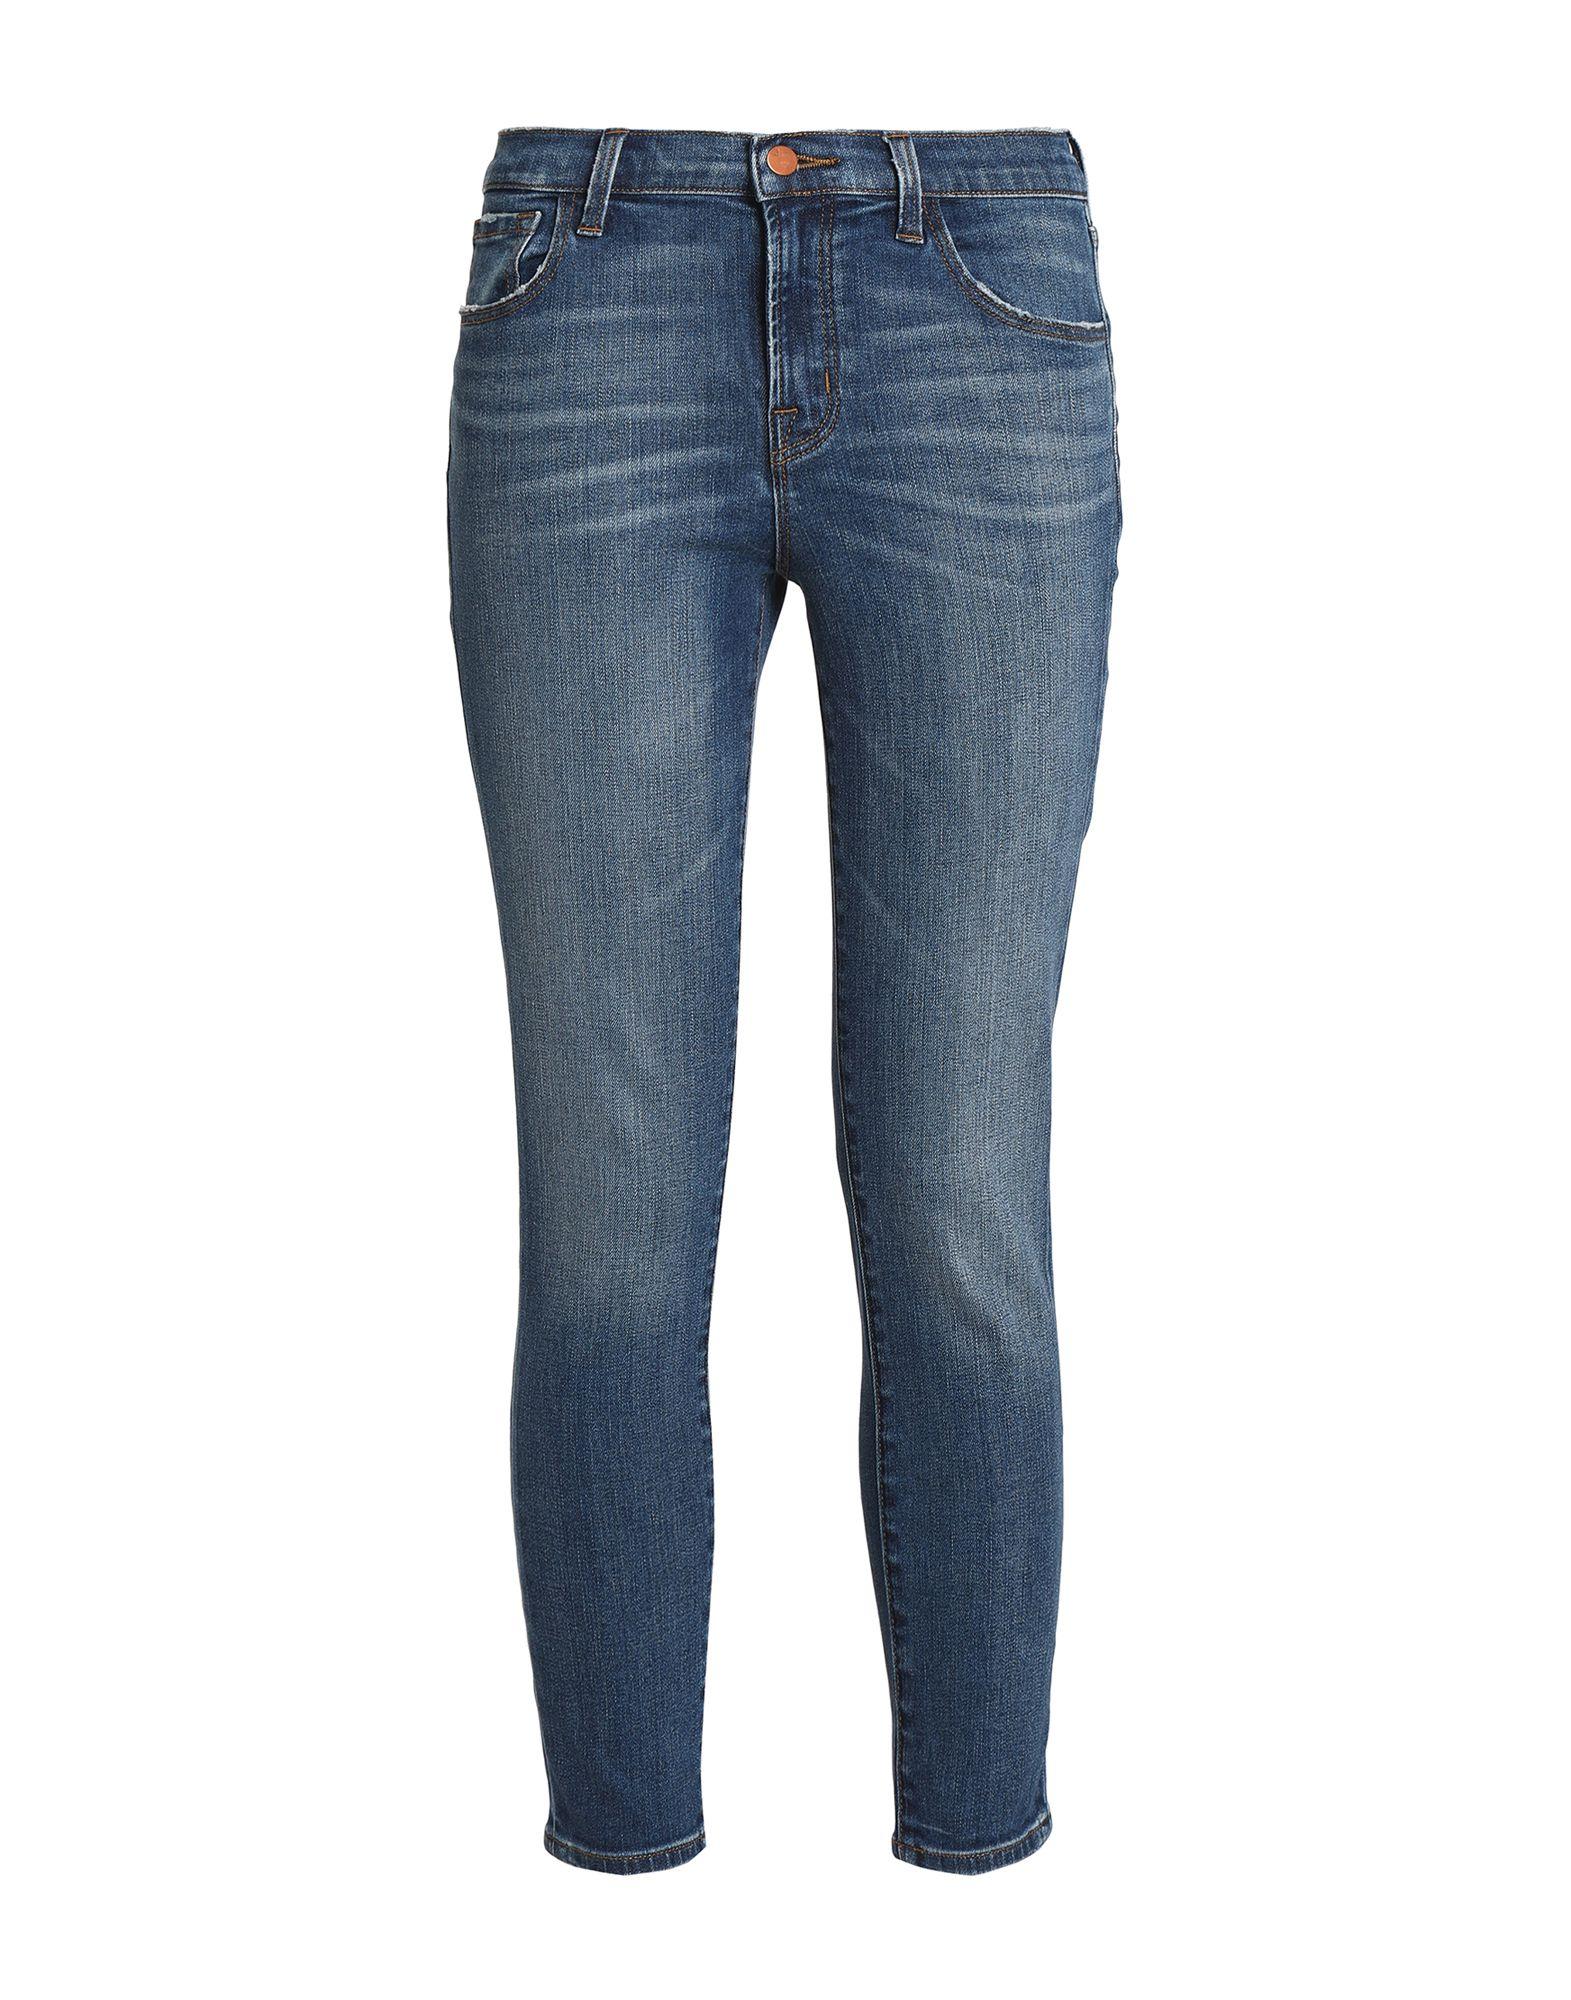 J BRAND for TRILOGY Denim pants - Item 42753242